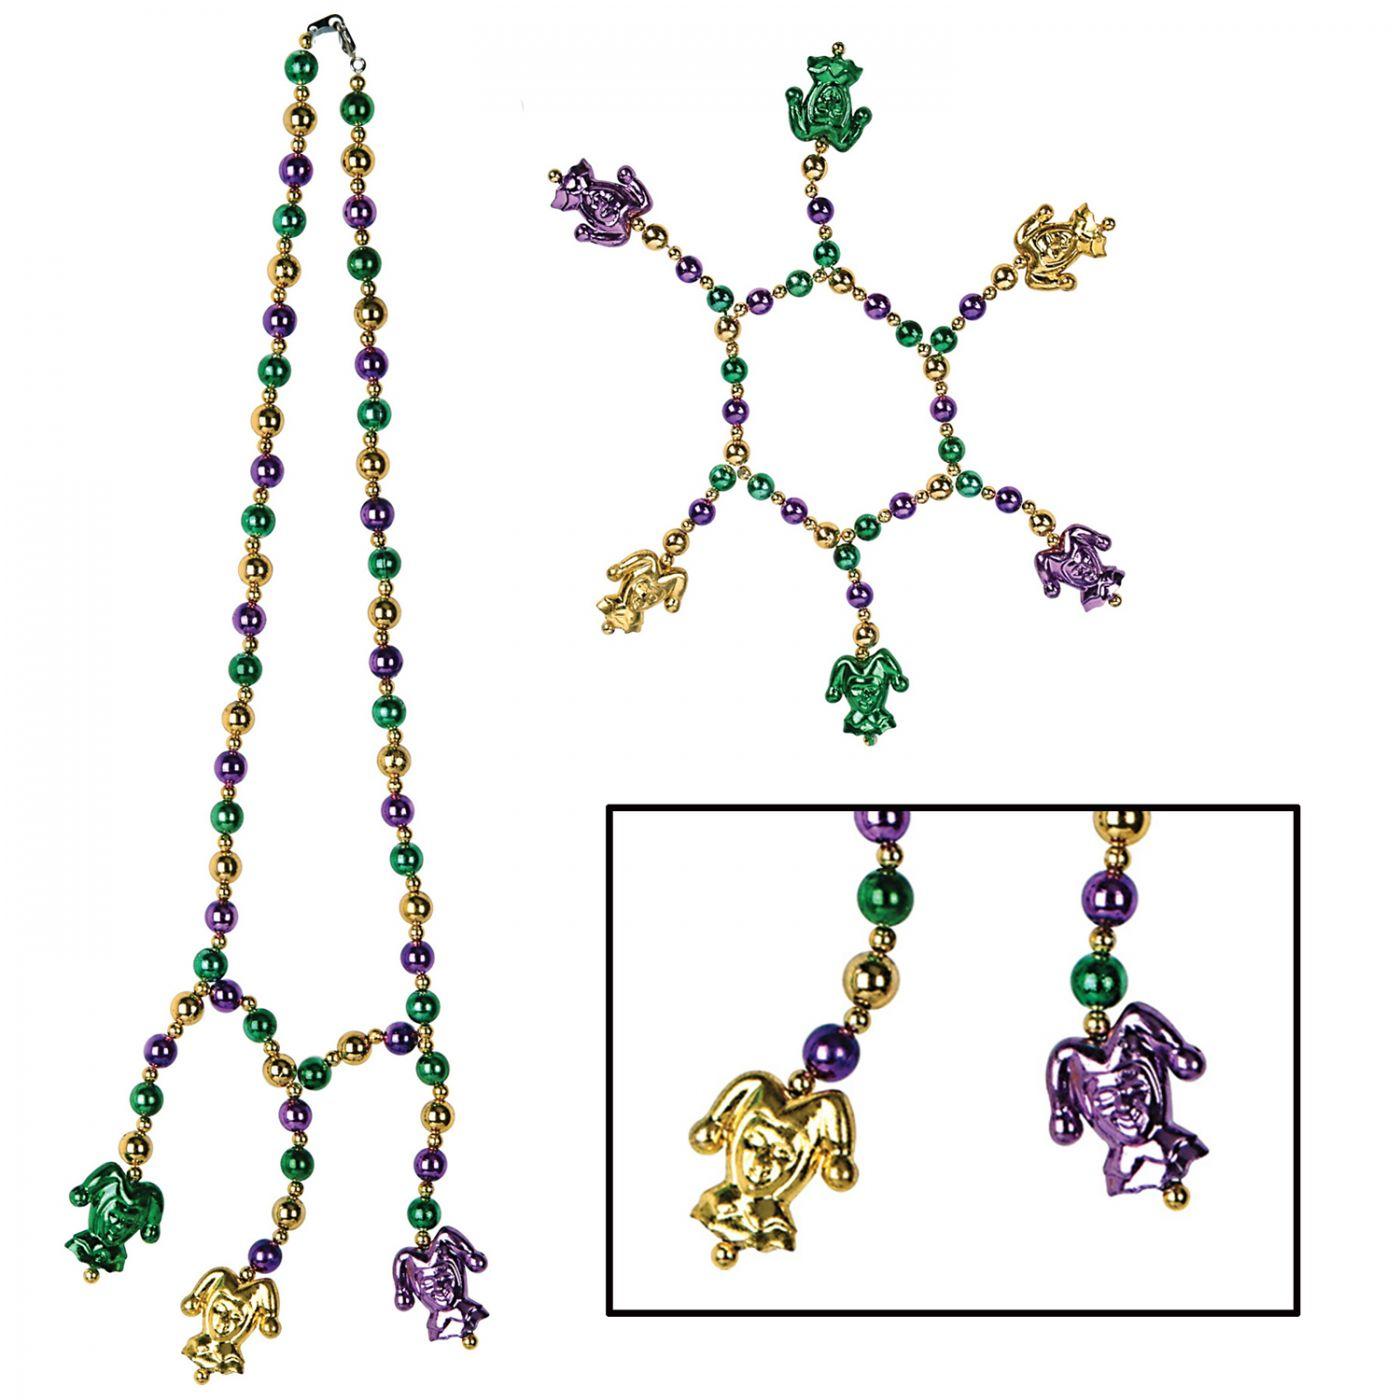 Mardi Gras Beads Choker/Bracelet Set image